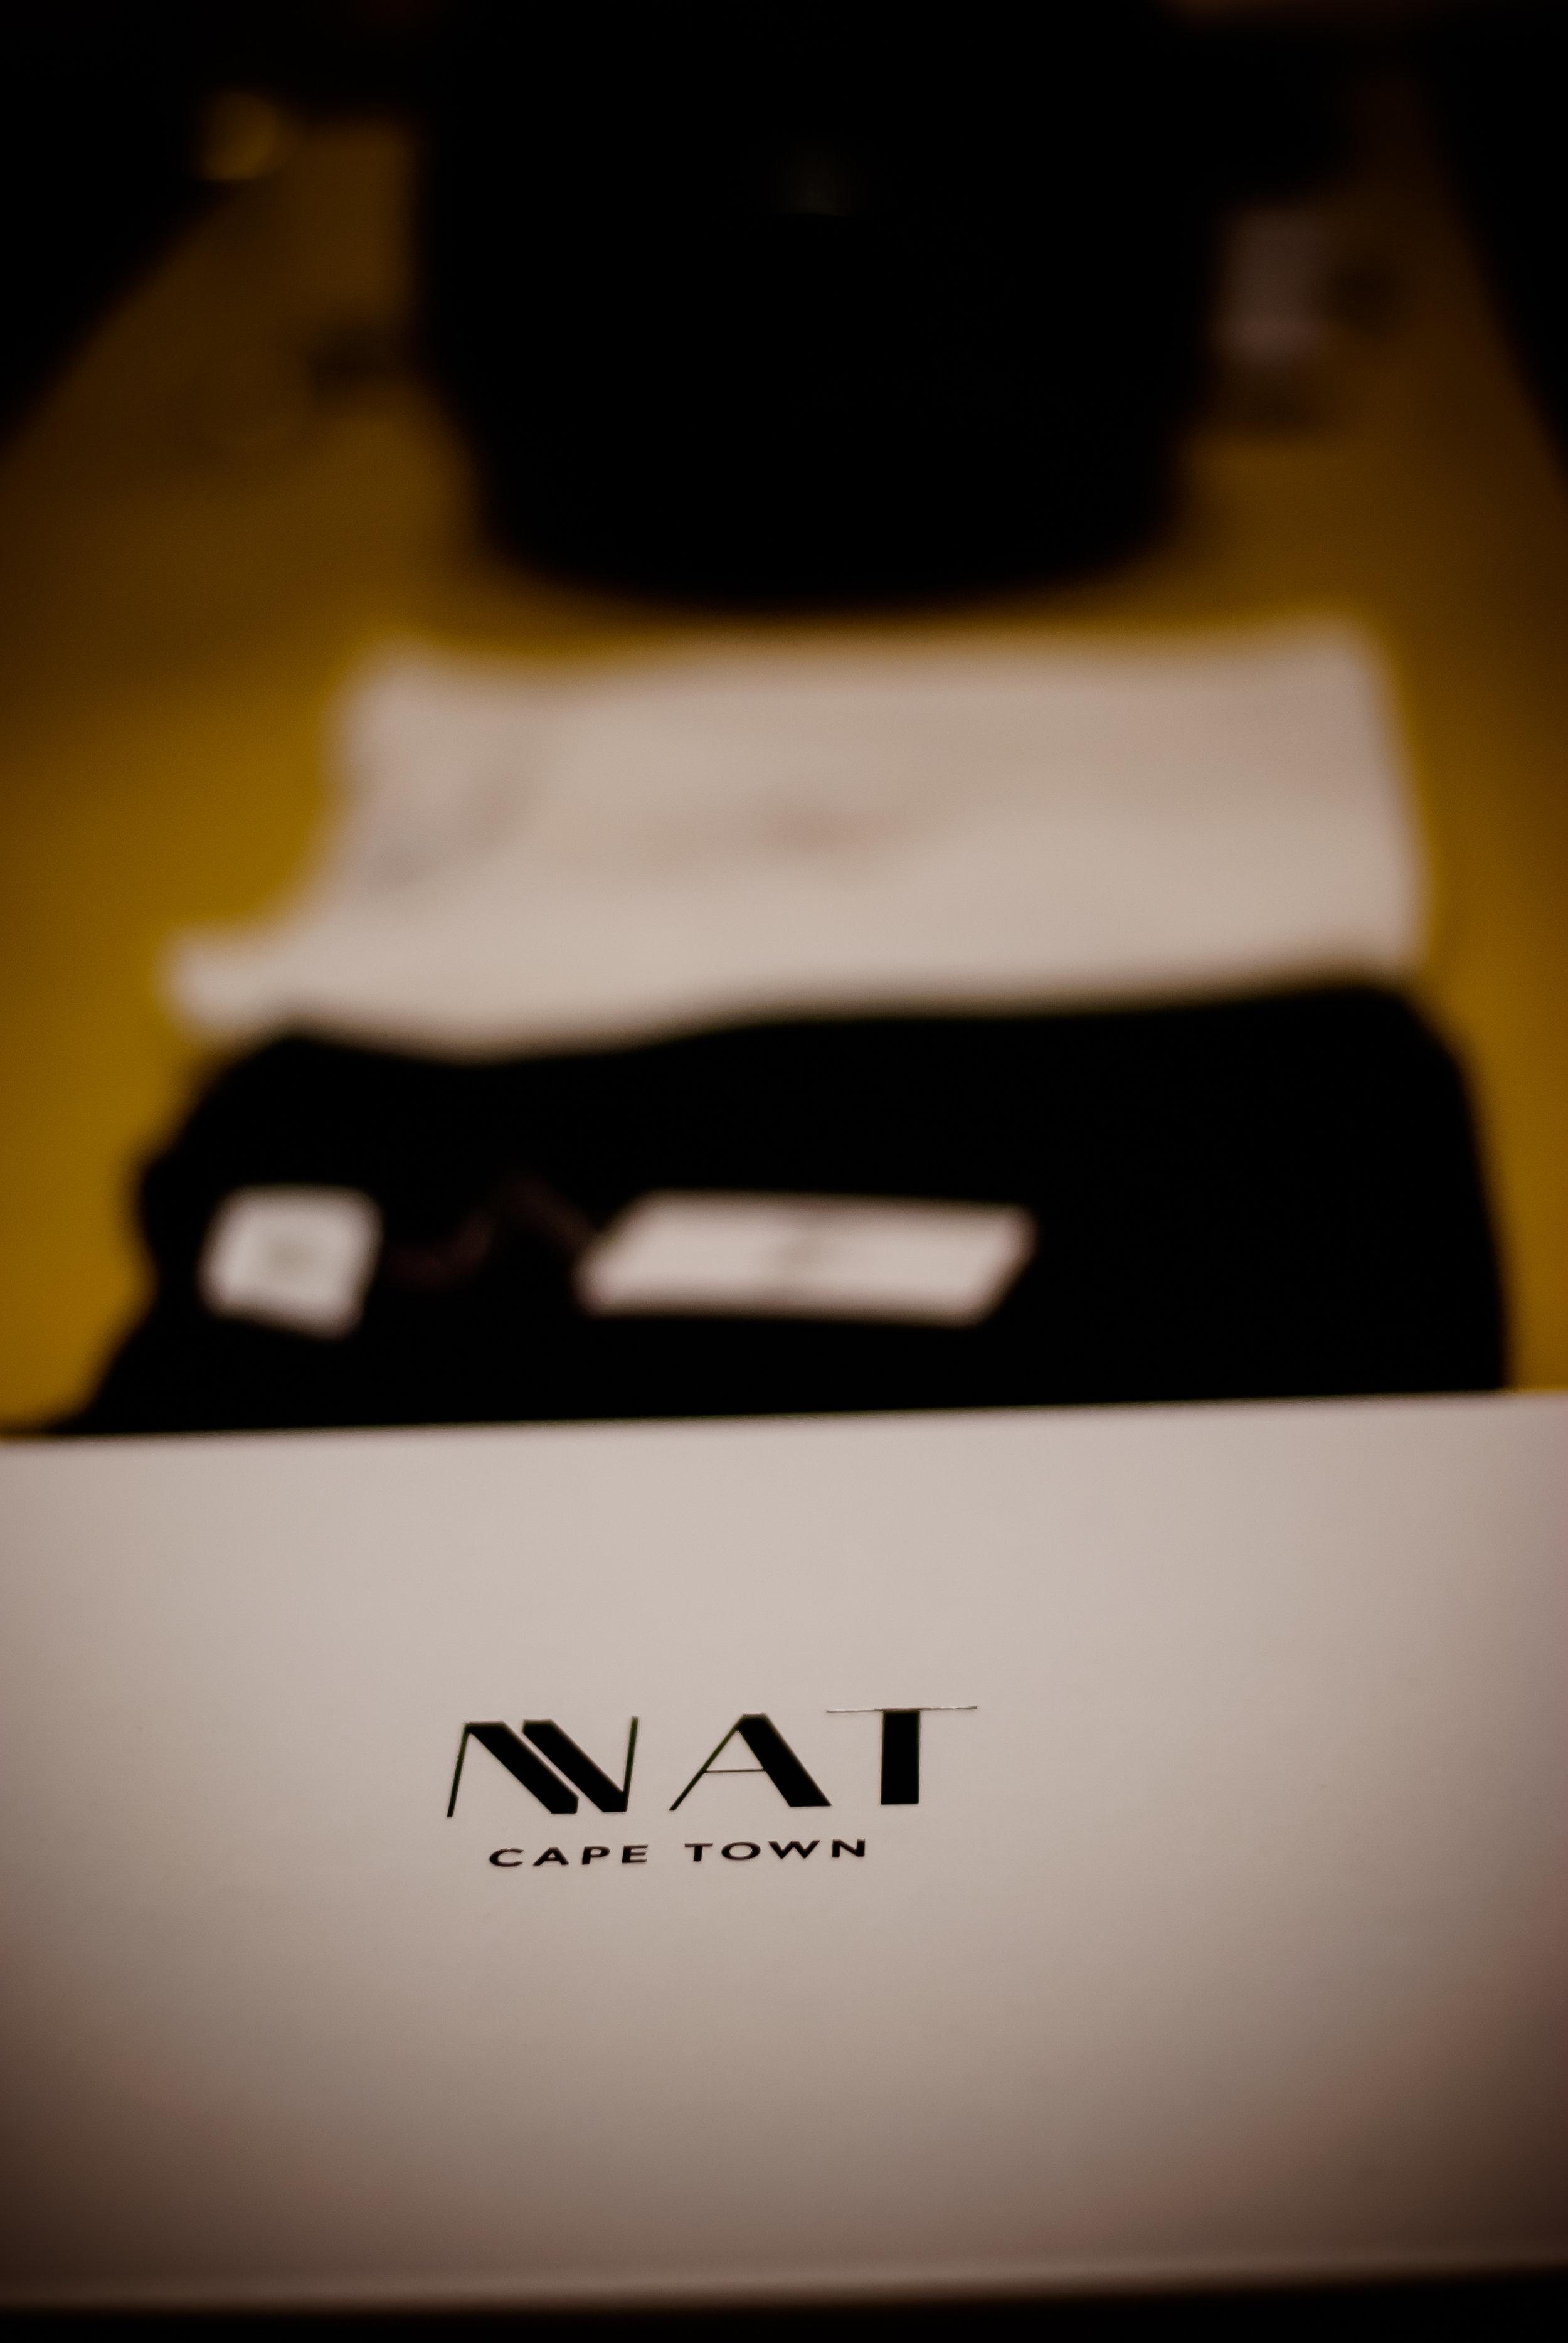 NATWear-91.jpg